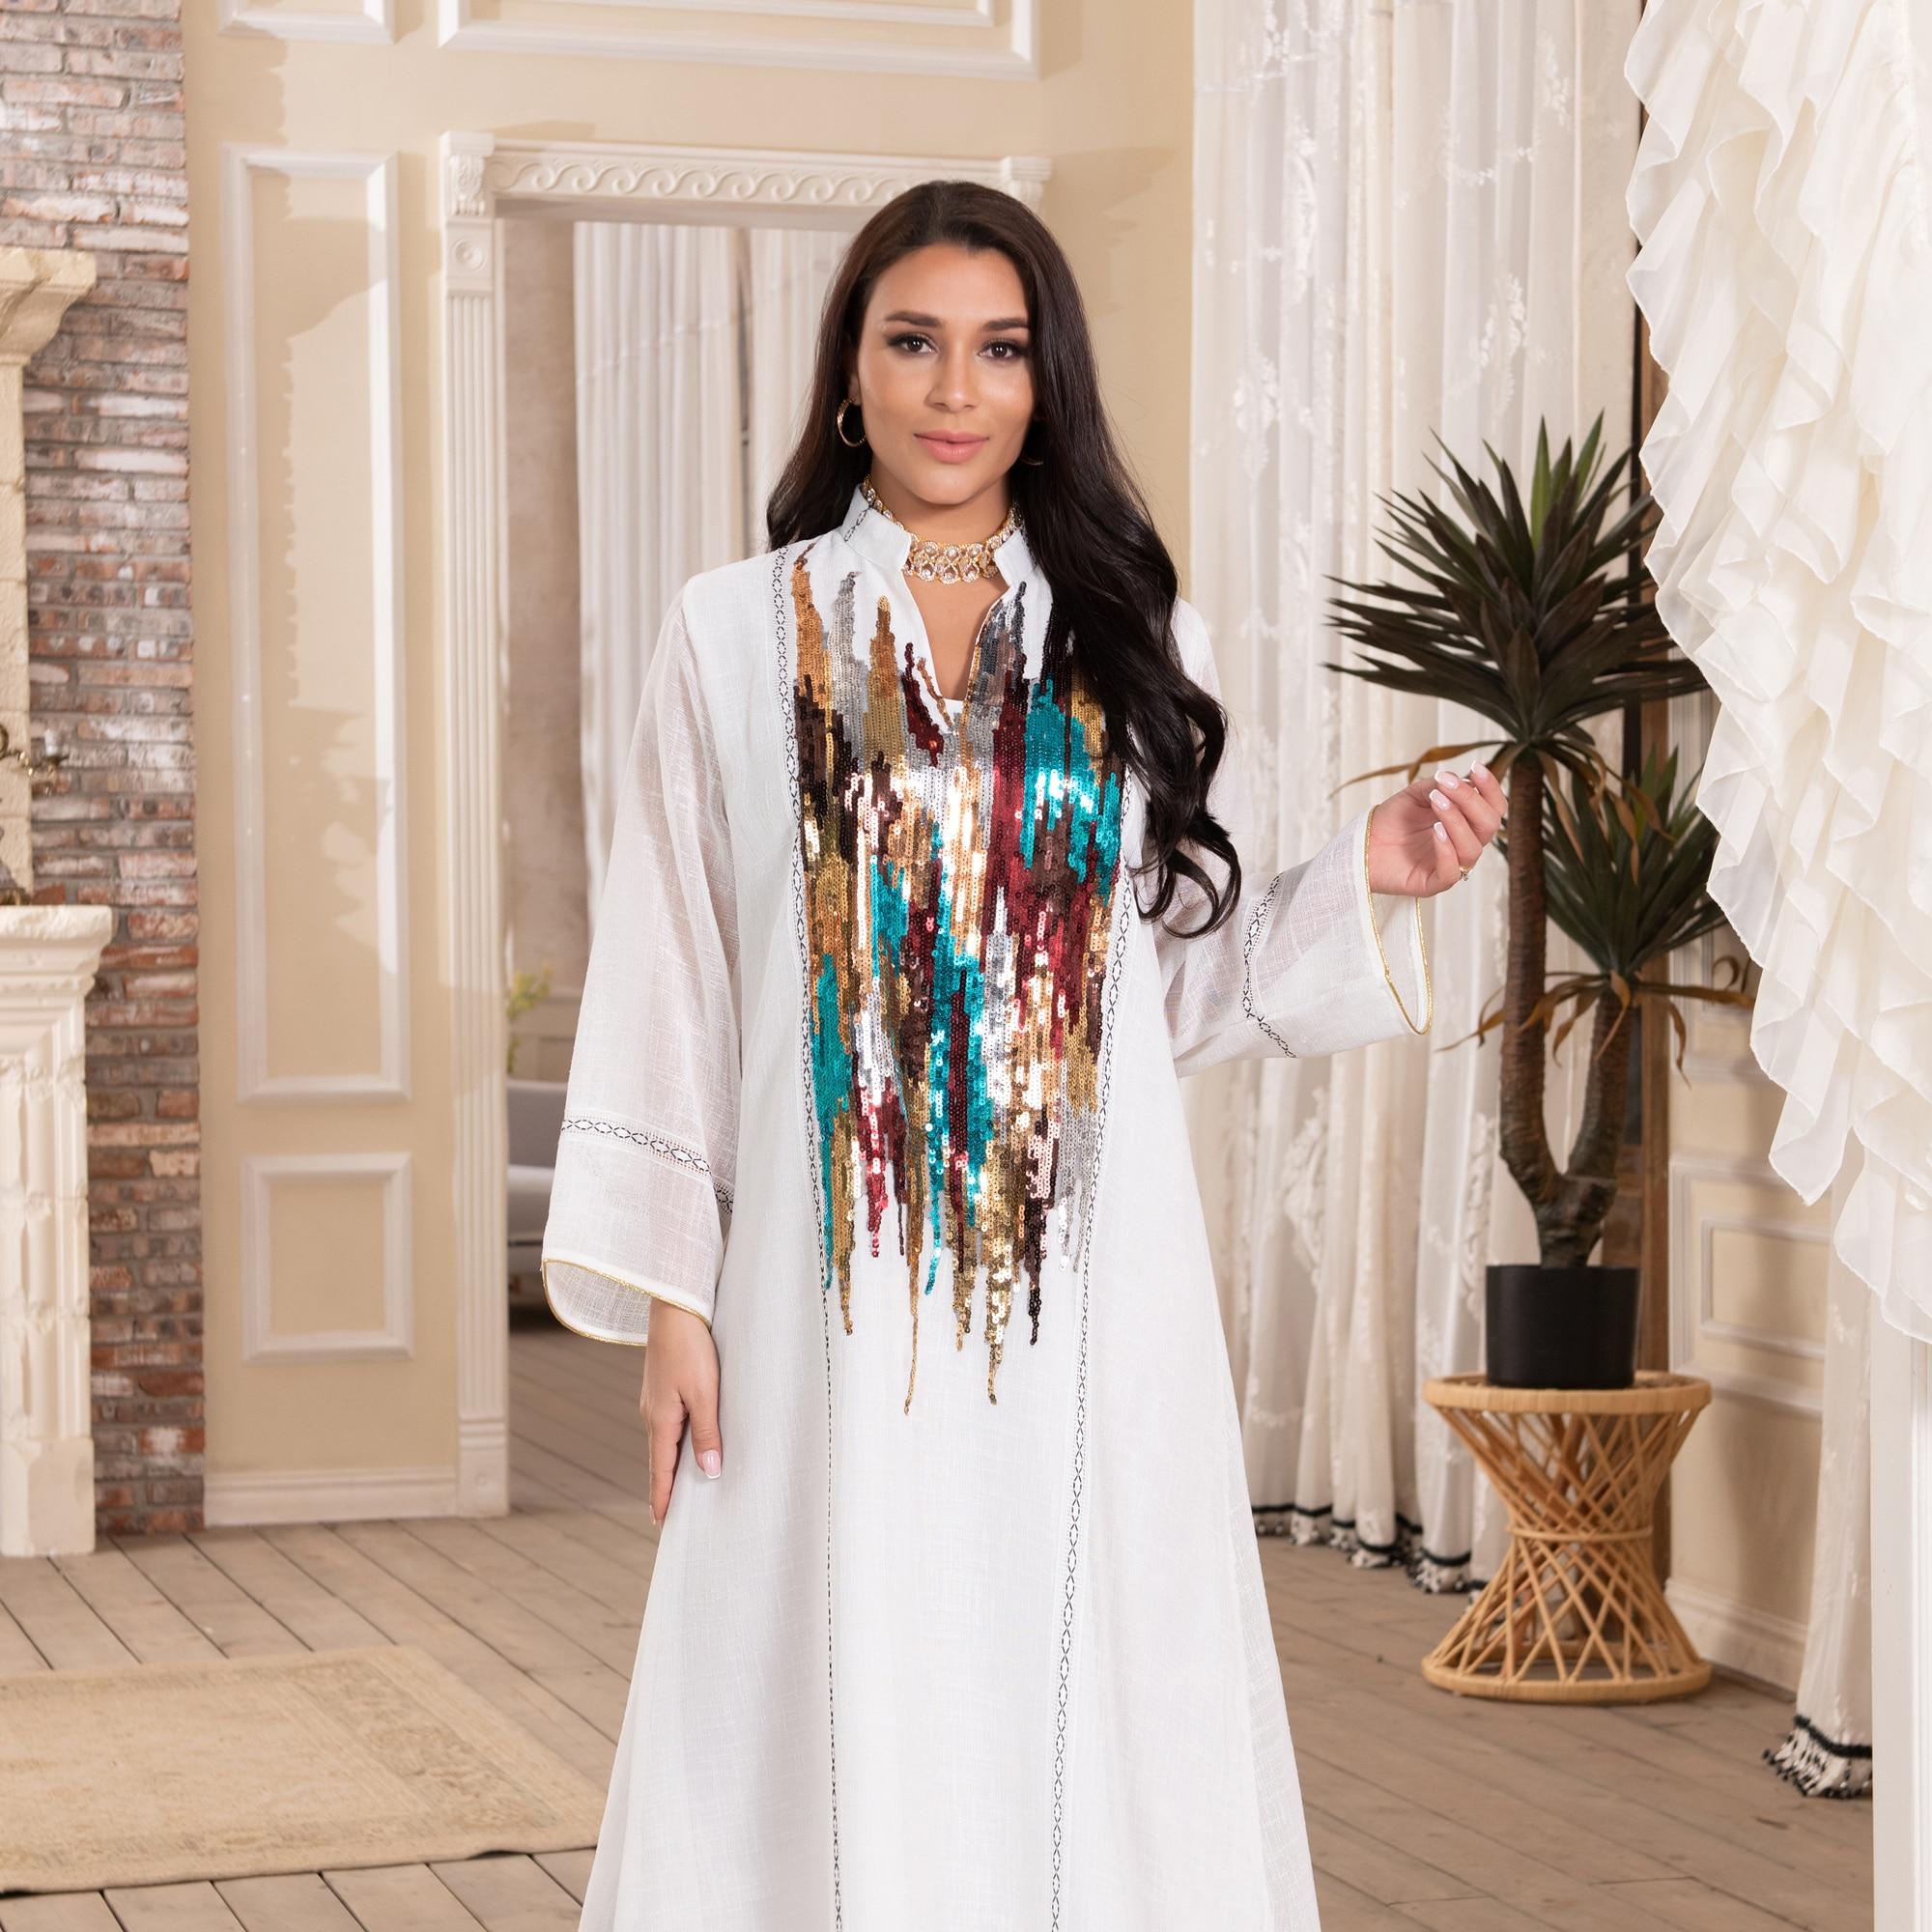 Vestido Abaya para mujer, ropa de noche marroquí, Dubái, Turco árabe, Jalabiya,...